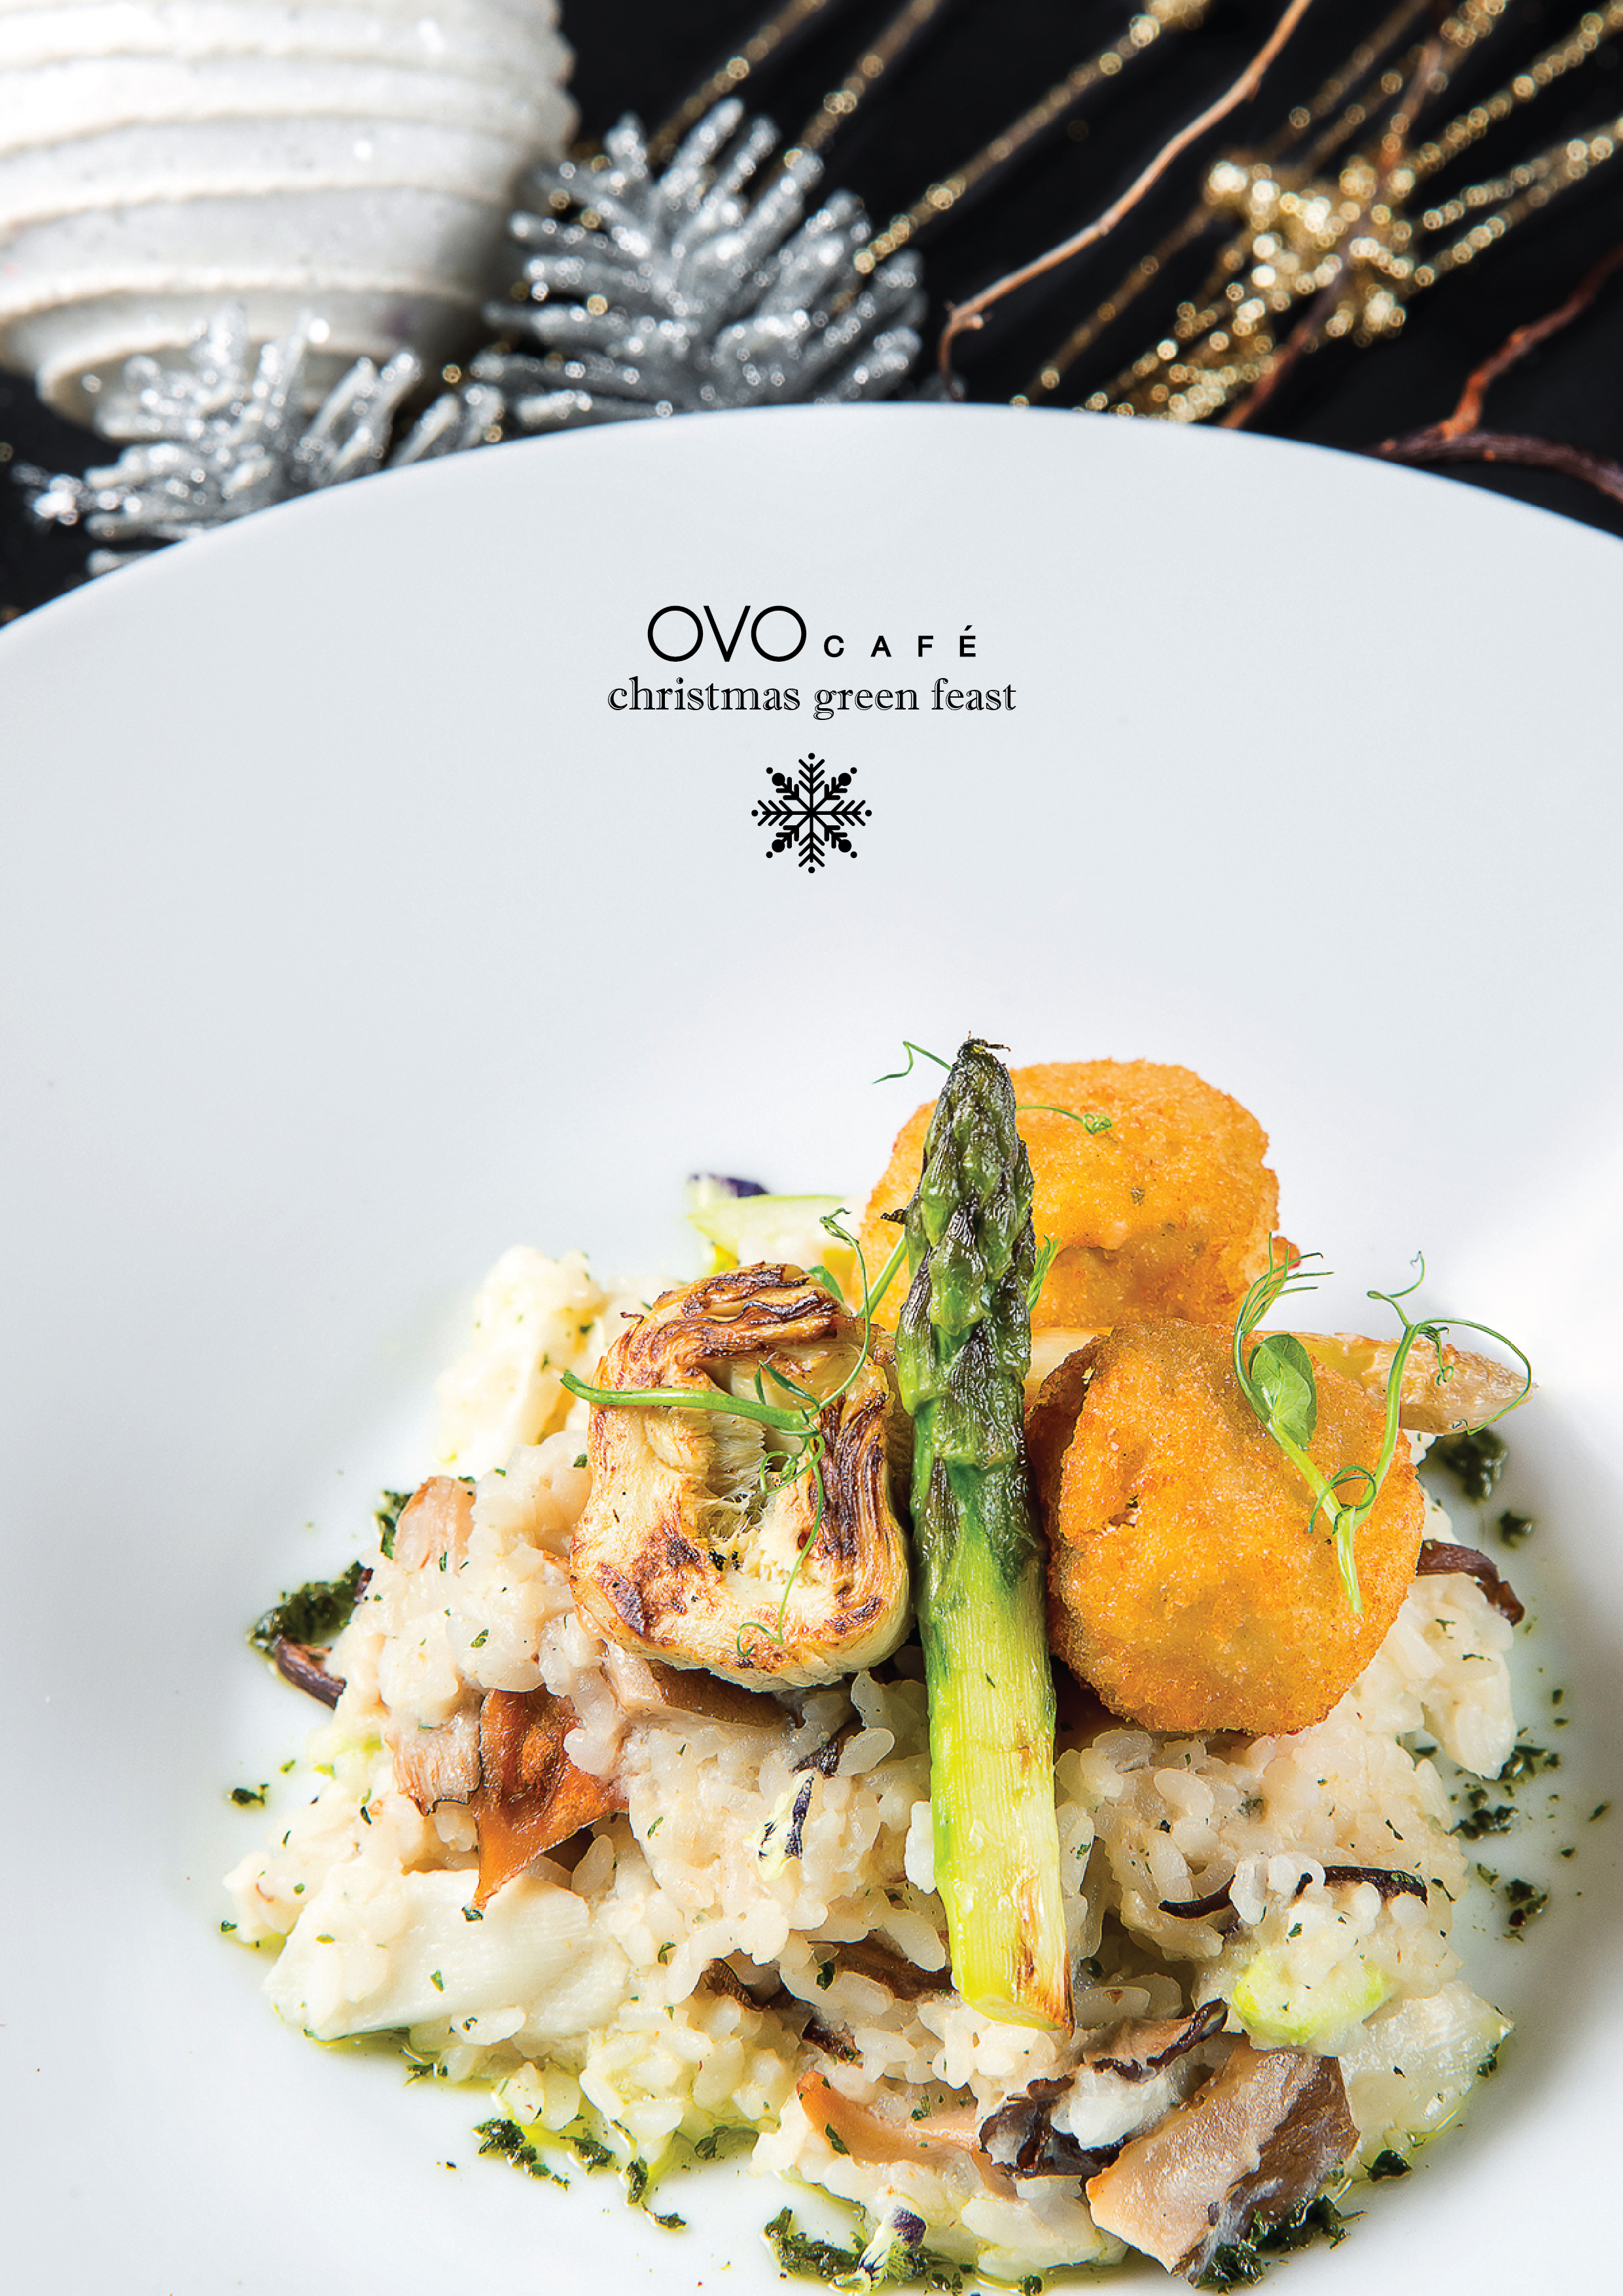 white asparagus rhubarb risotto with truffle cream sauce 松露忌廉汁白露筍意大利飯